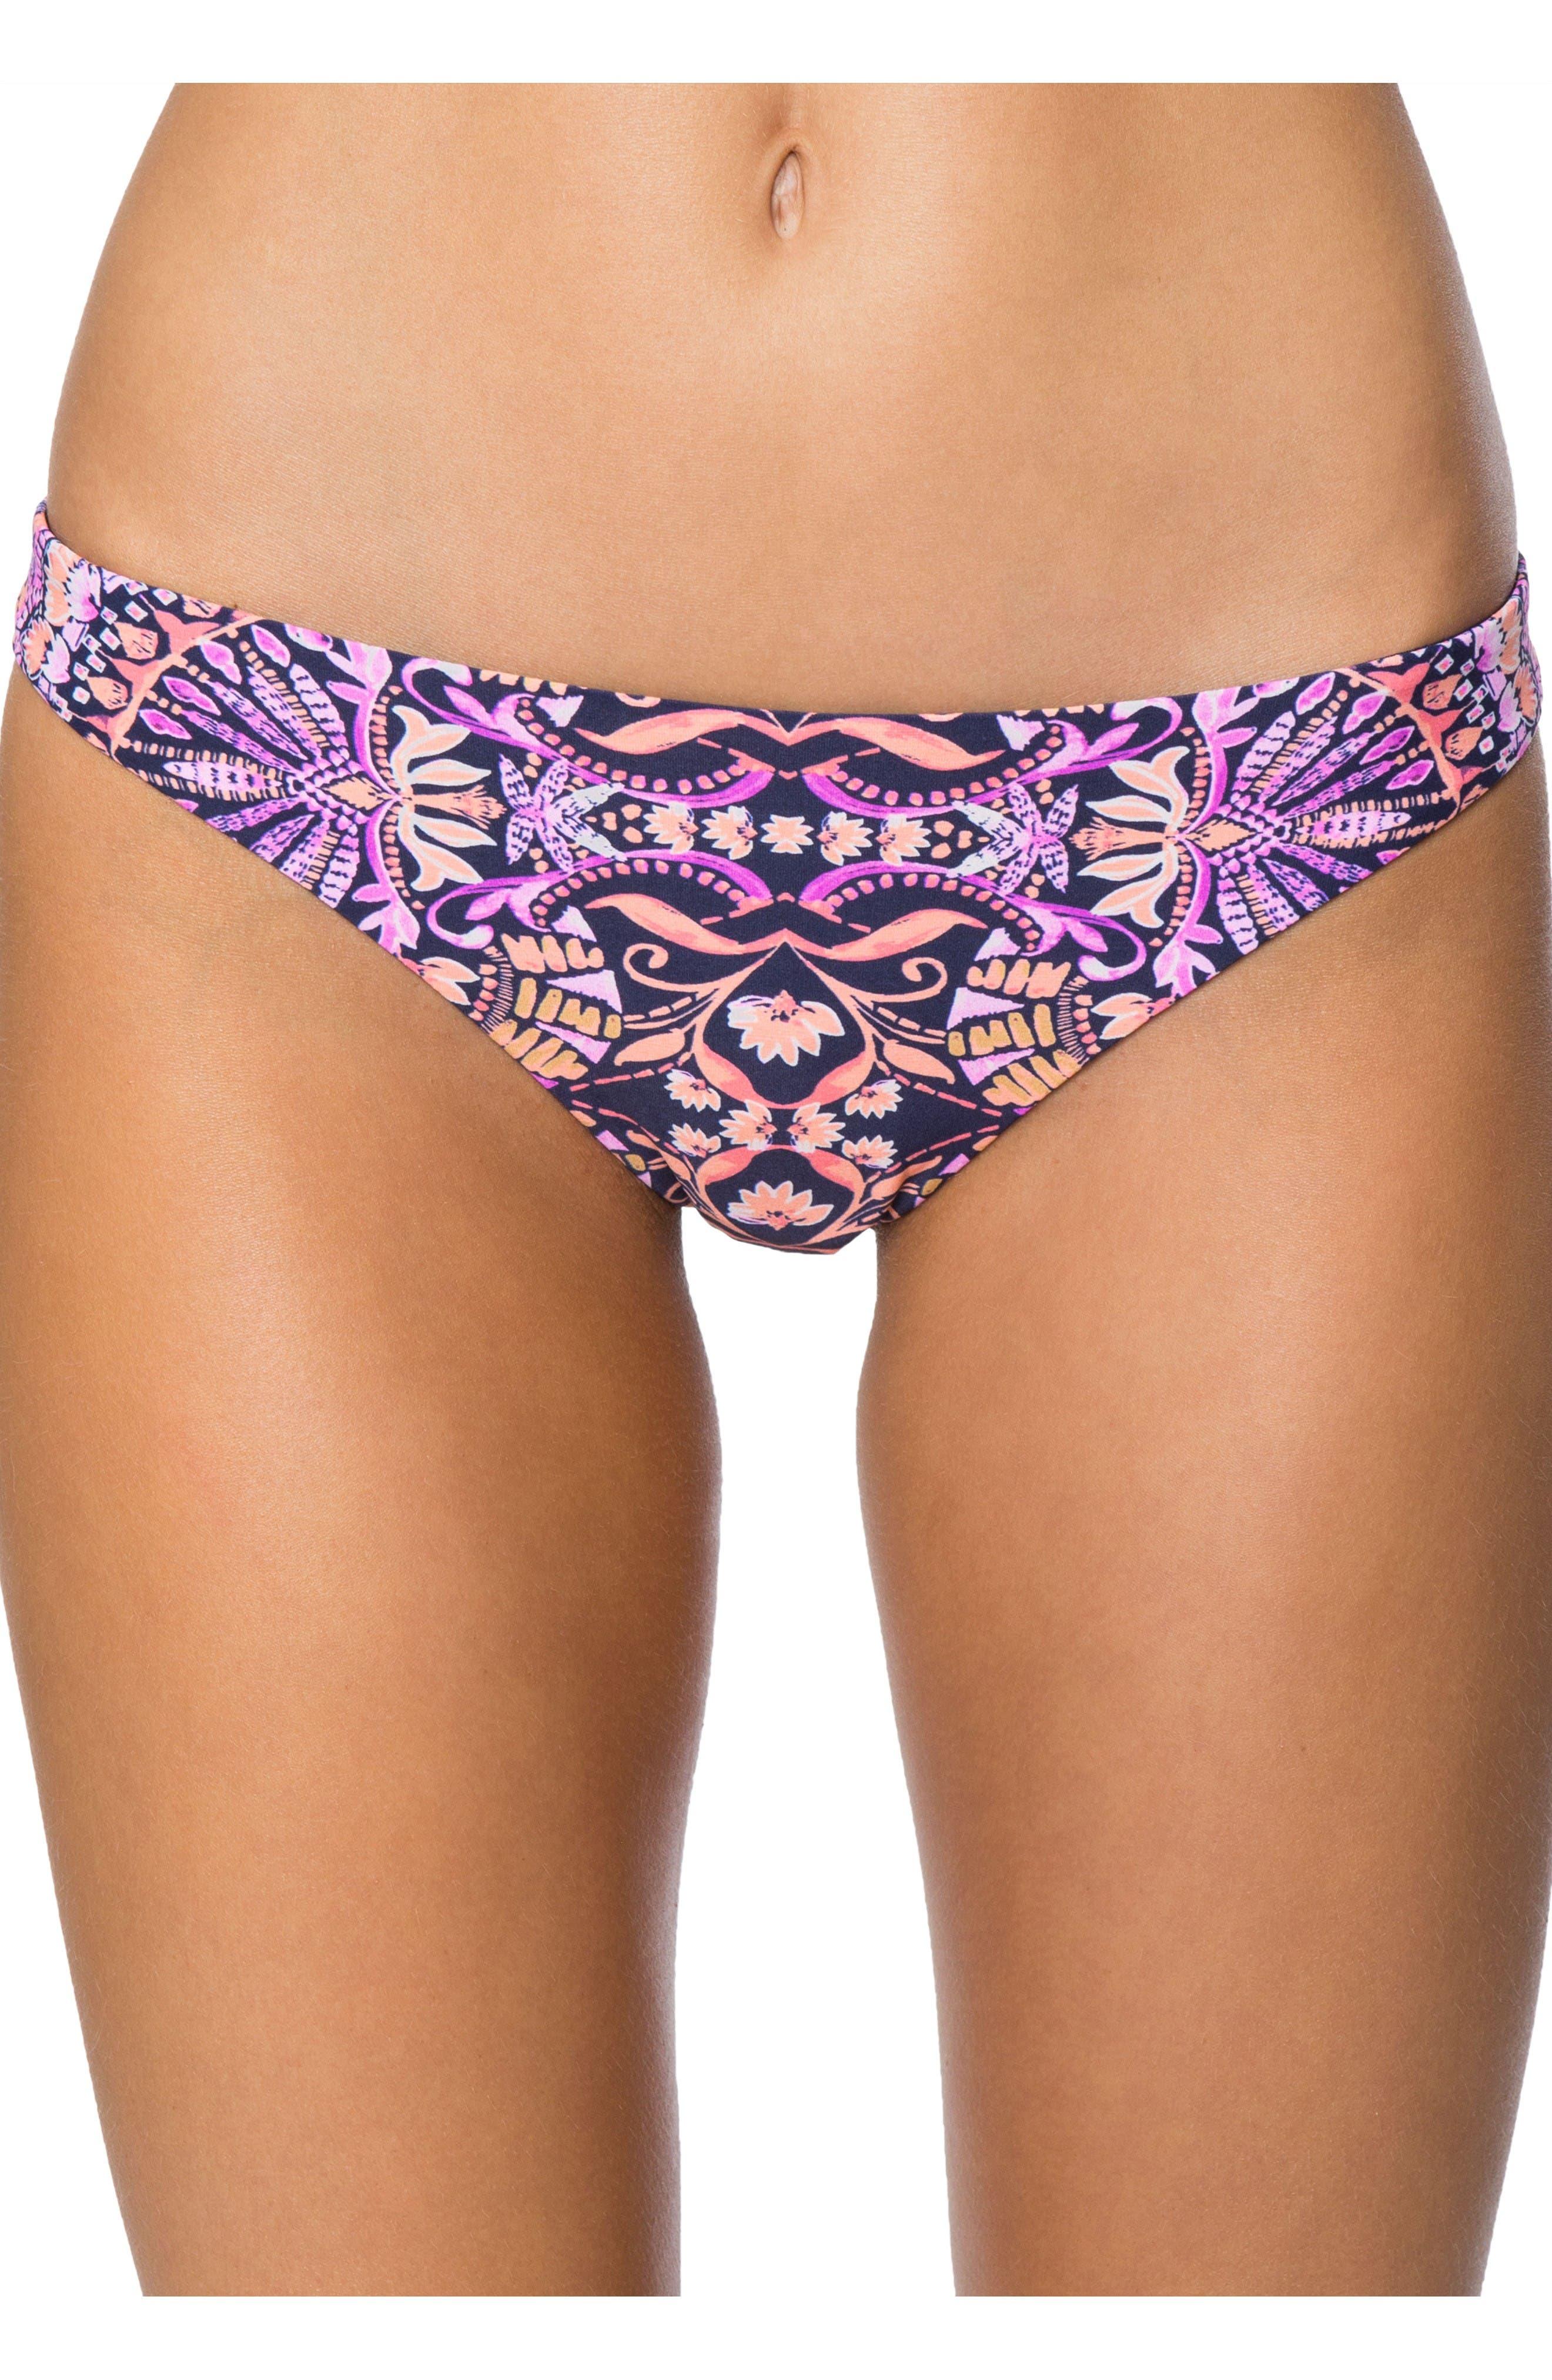 O'NEILL Surf Bizarre Classic Bikini Bottoms